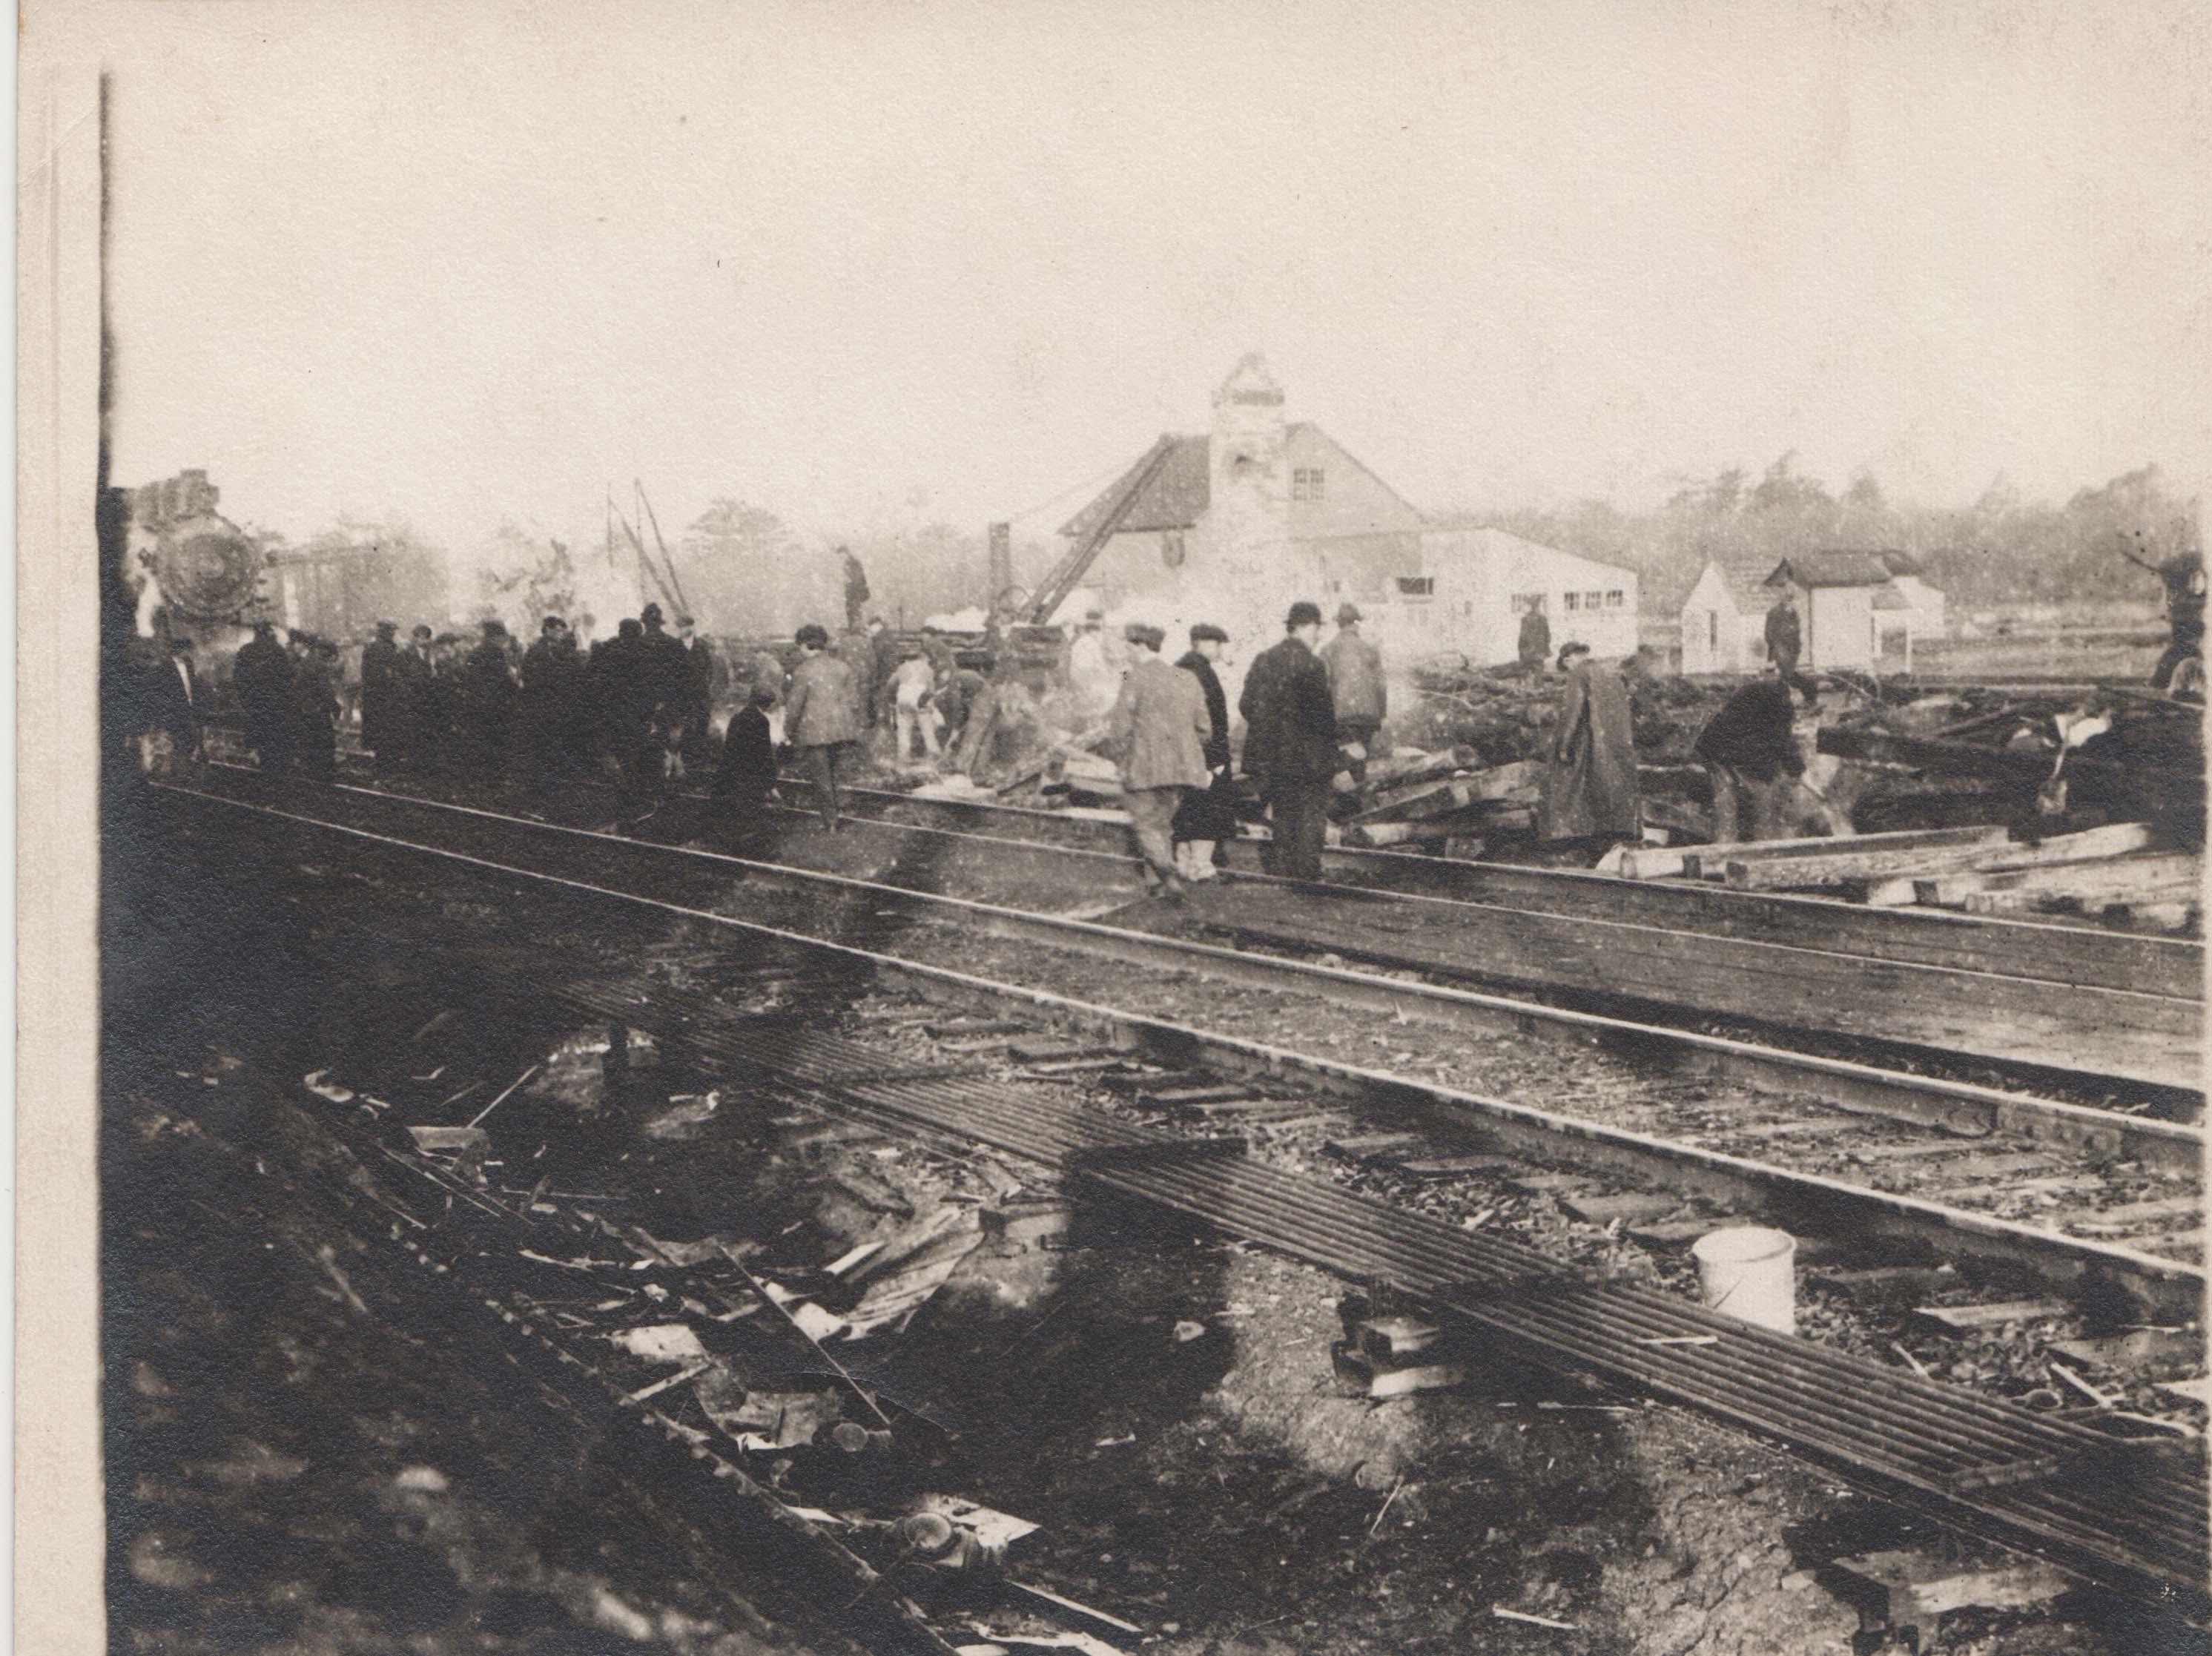 0212A Crowds on railroad